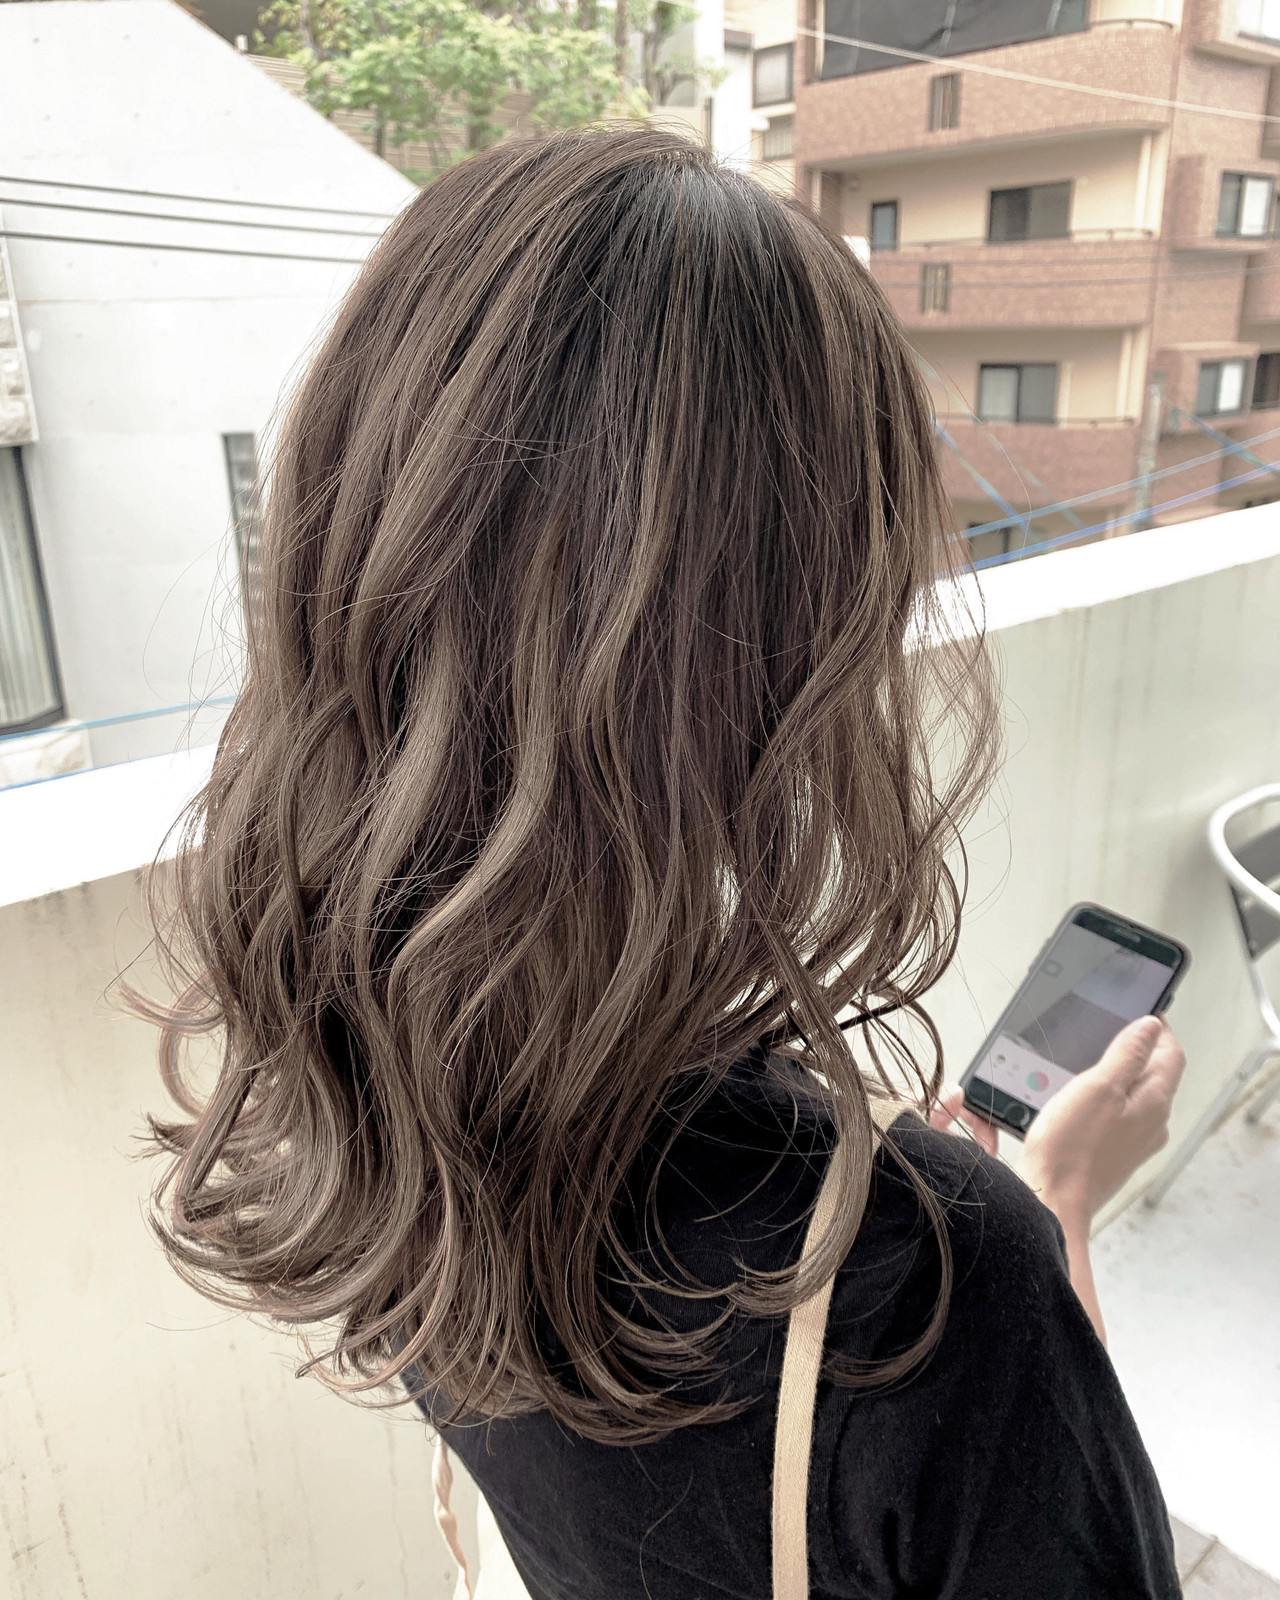 3Dハイライト デート セミロング 大人ハイライトヘアスタイルや髪型の写真・画像